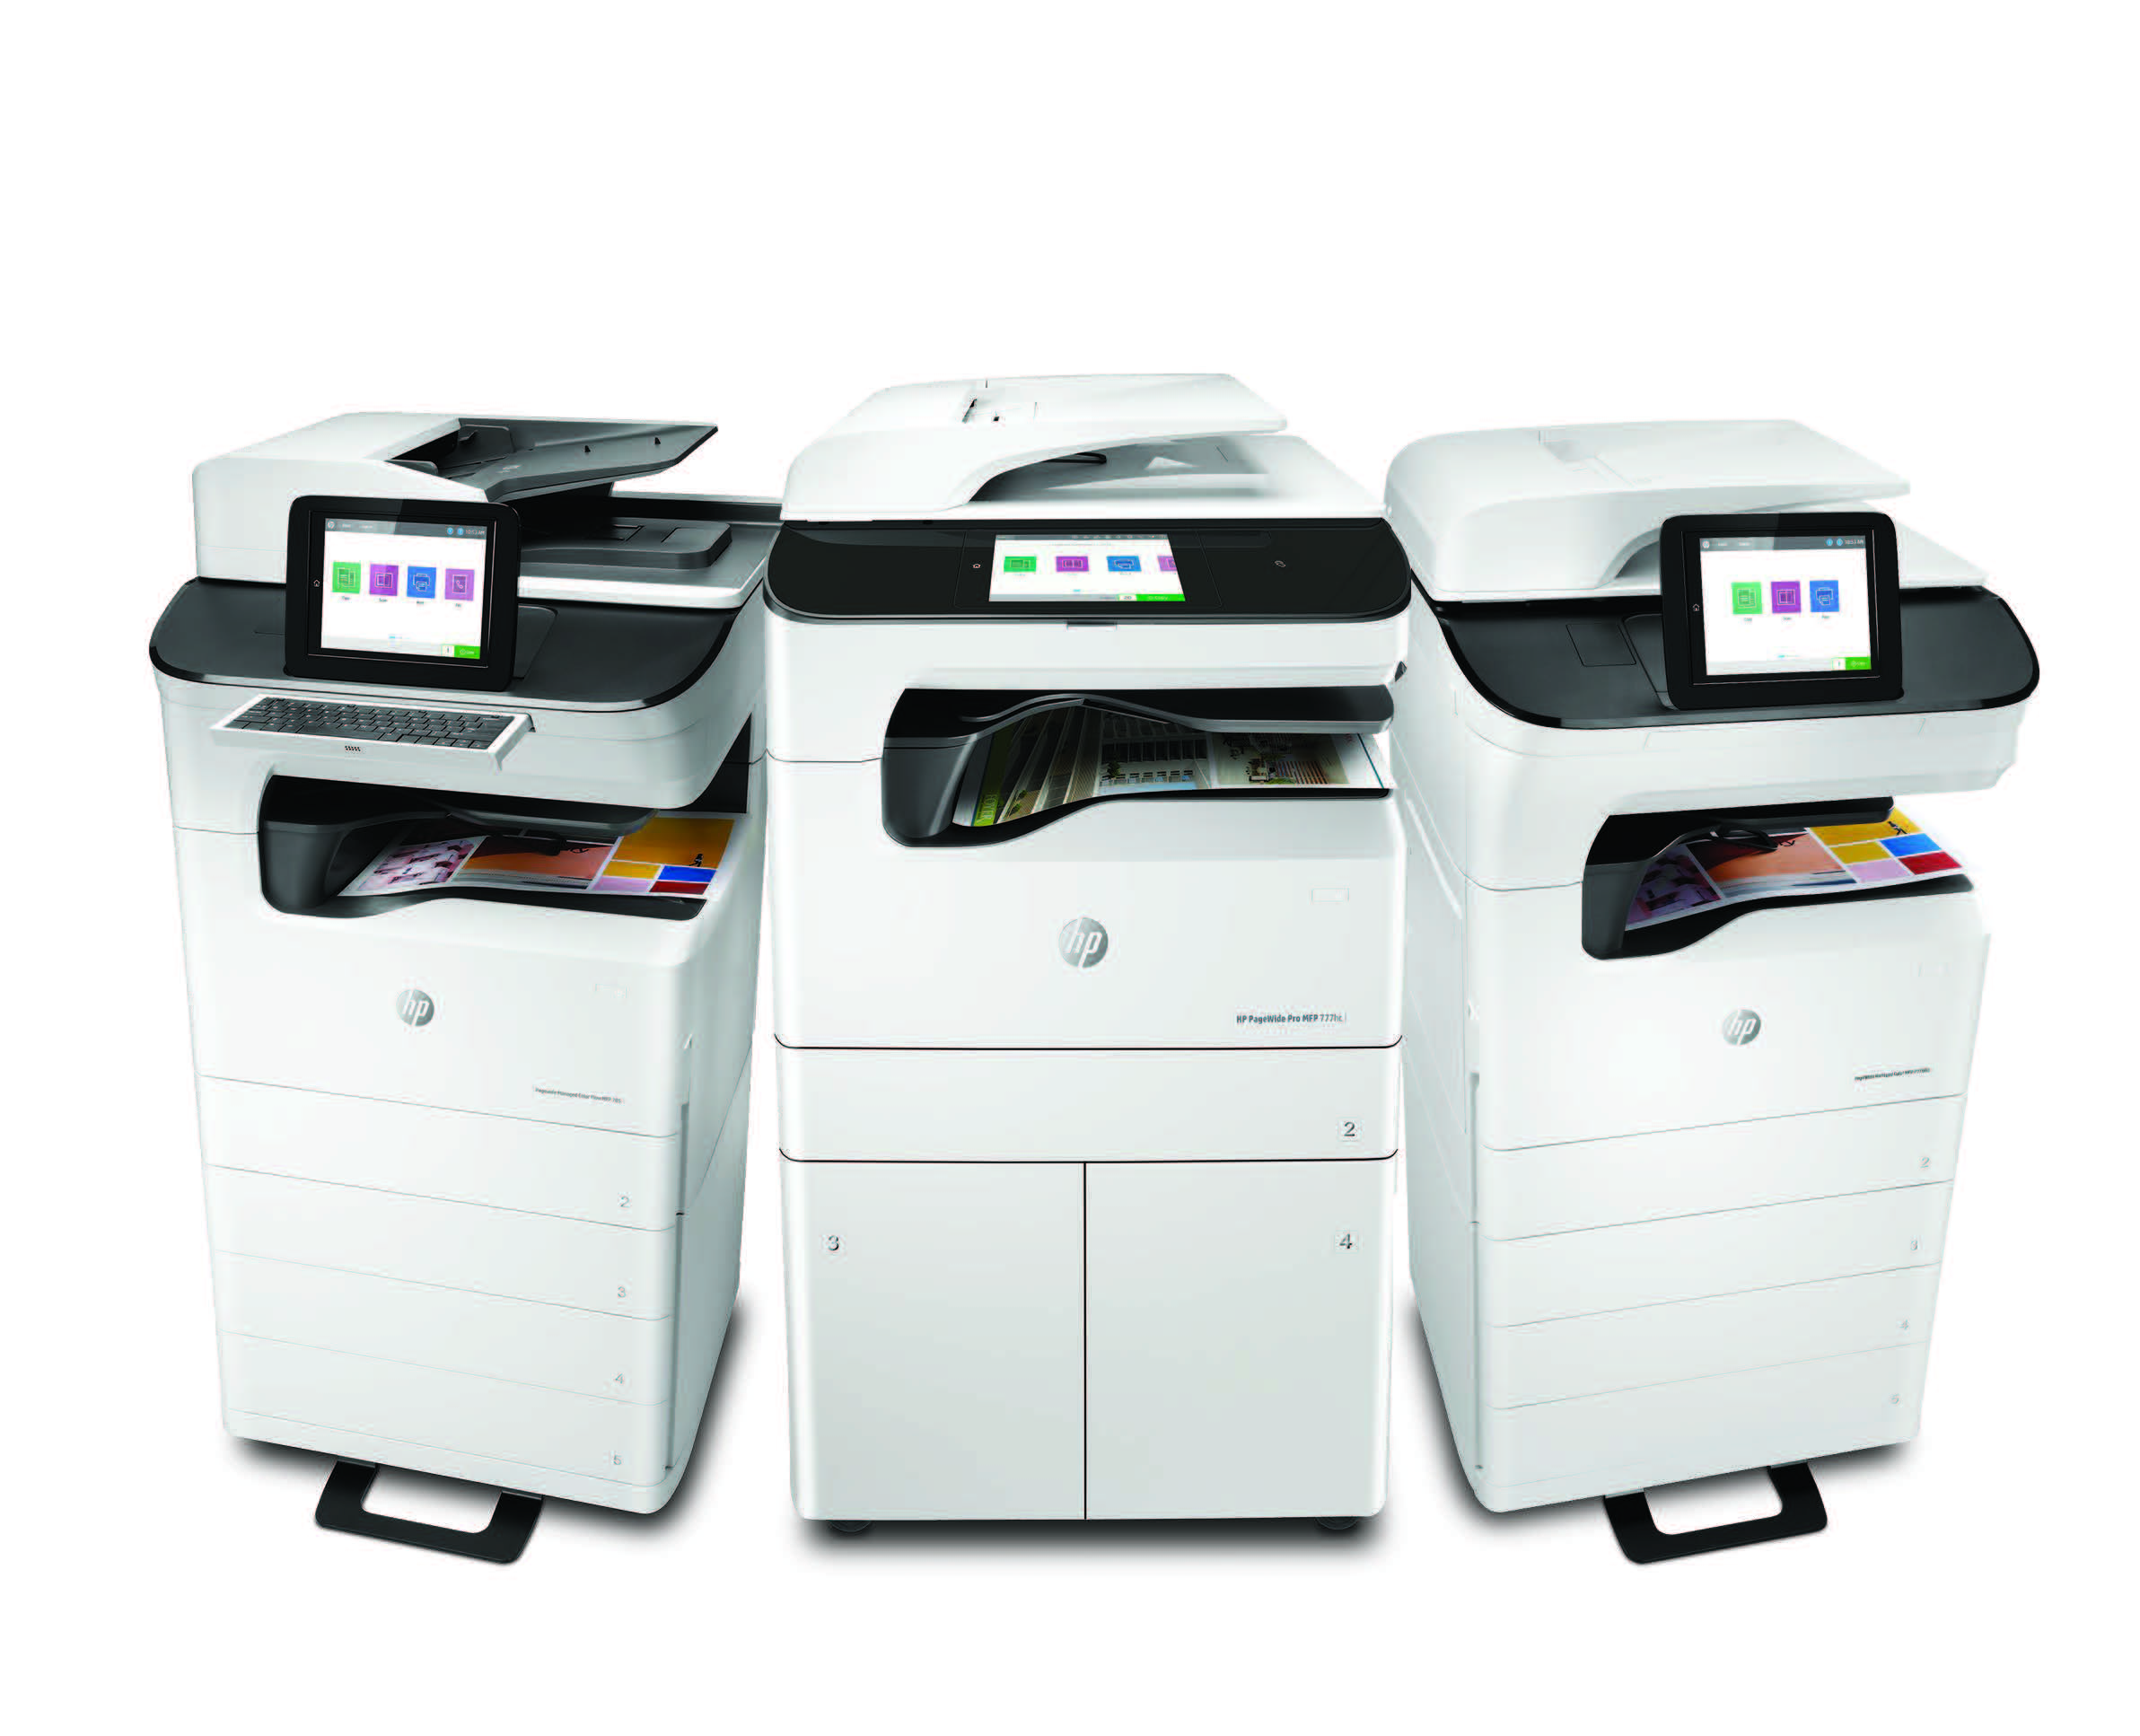 tiskárny řady hp pagewide